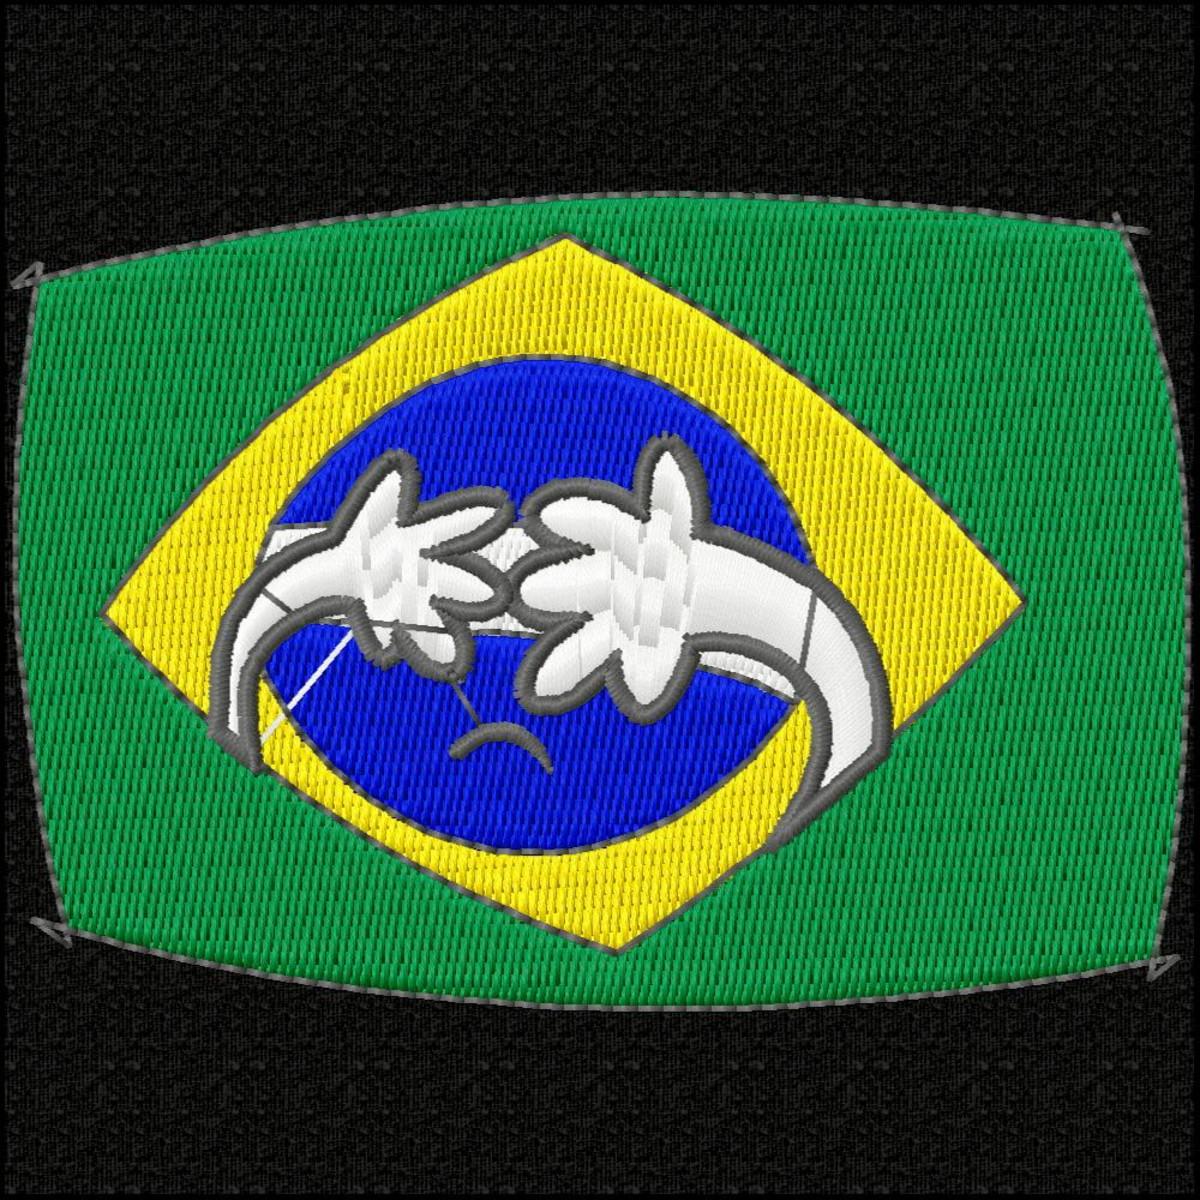 Matriz de bordado BCI0413 brasil vergonha no Elo7 | MERCADO DOS BORDADOS (D90121)